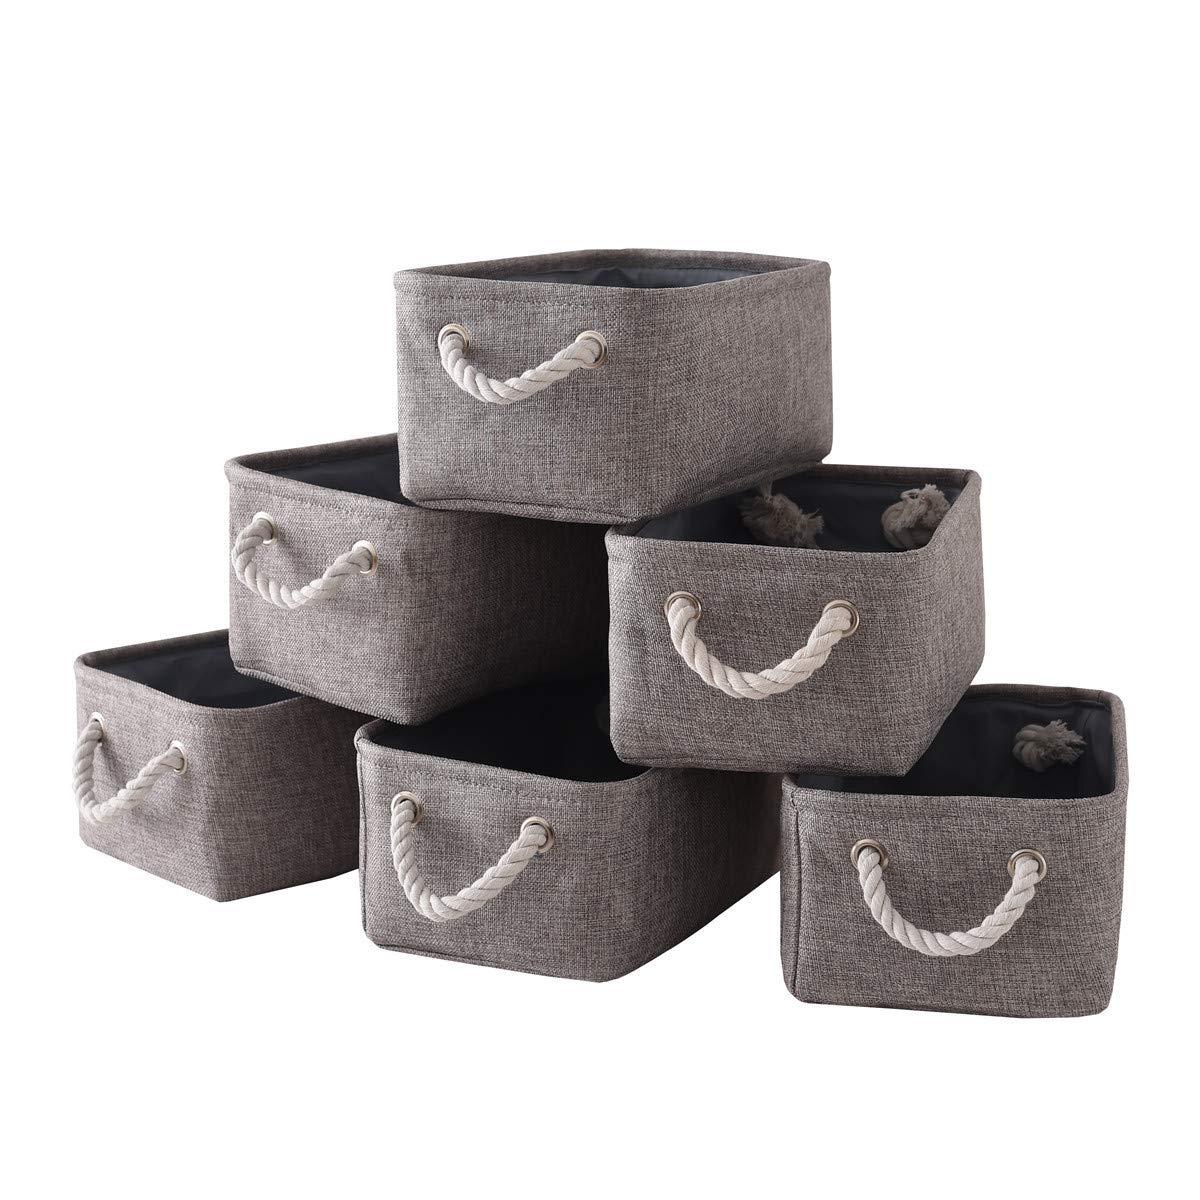 Cute Animal Collapsible Toy Storage Organizer Folding: Amazon.com: TheWarmHome Storage Bins Baskets For Shelves